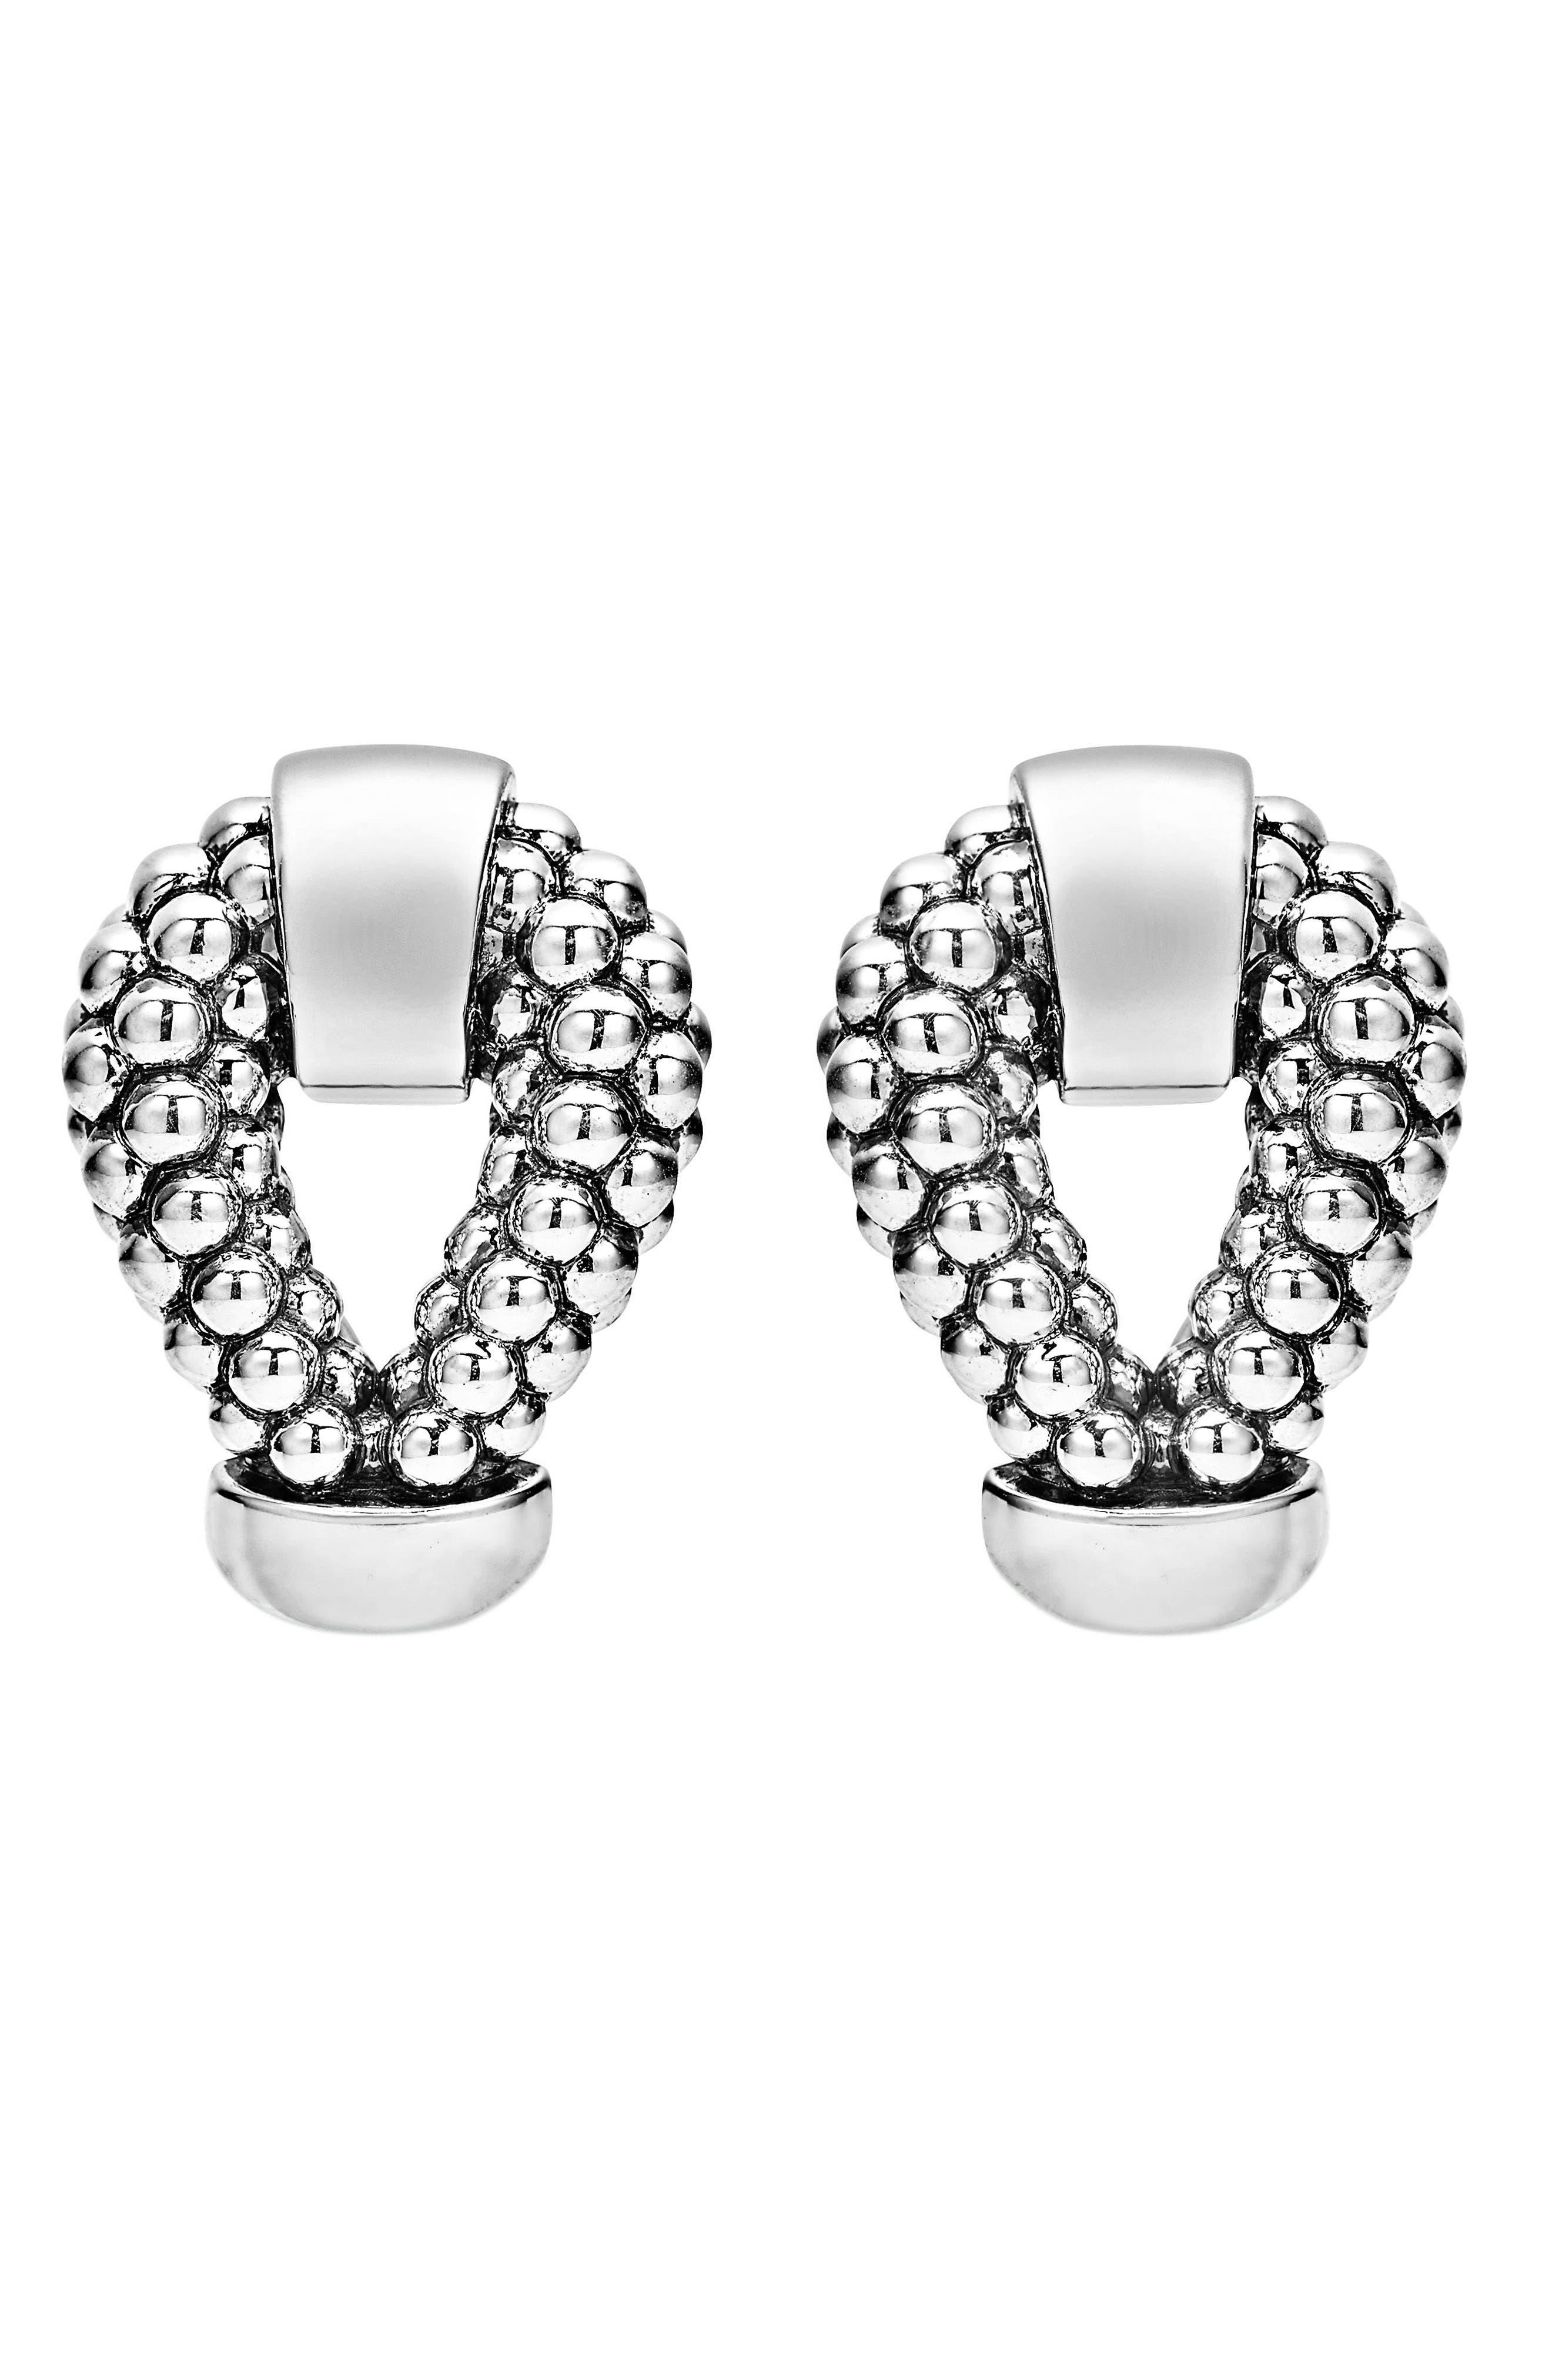 Derby Caviar Stud Earrings,                             Alternate thumbnail 2, color,                             SILVER